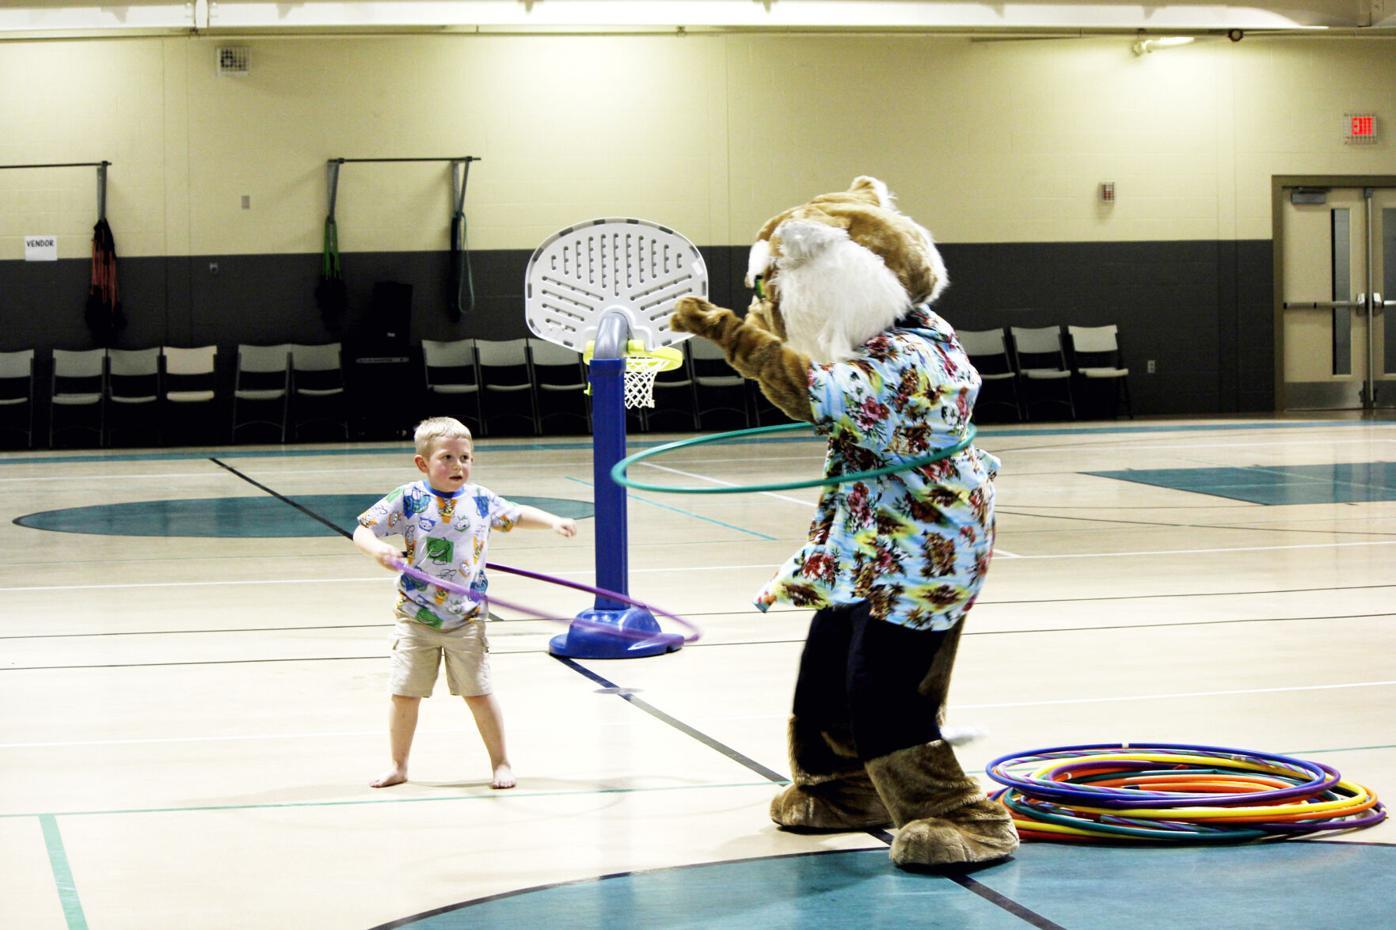 6-3-21 Kids Block Party 2.jpg